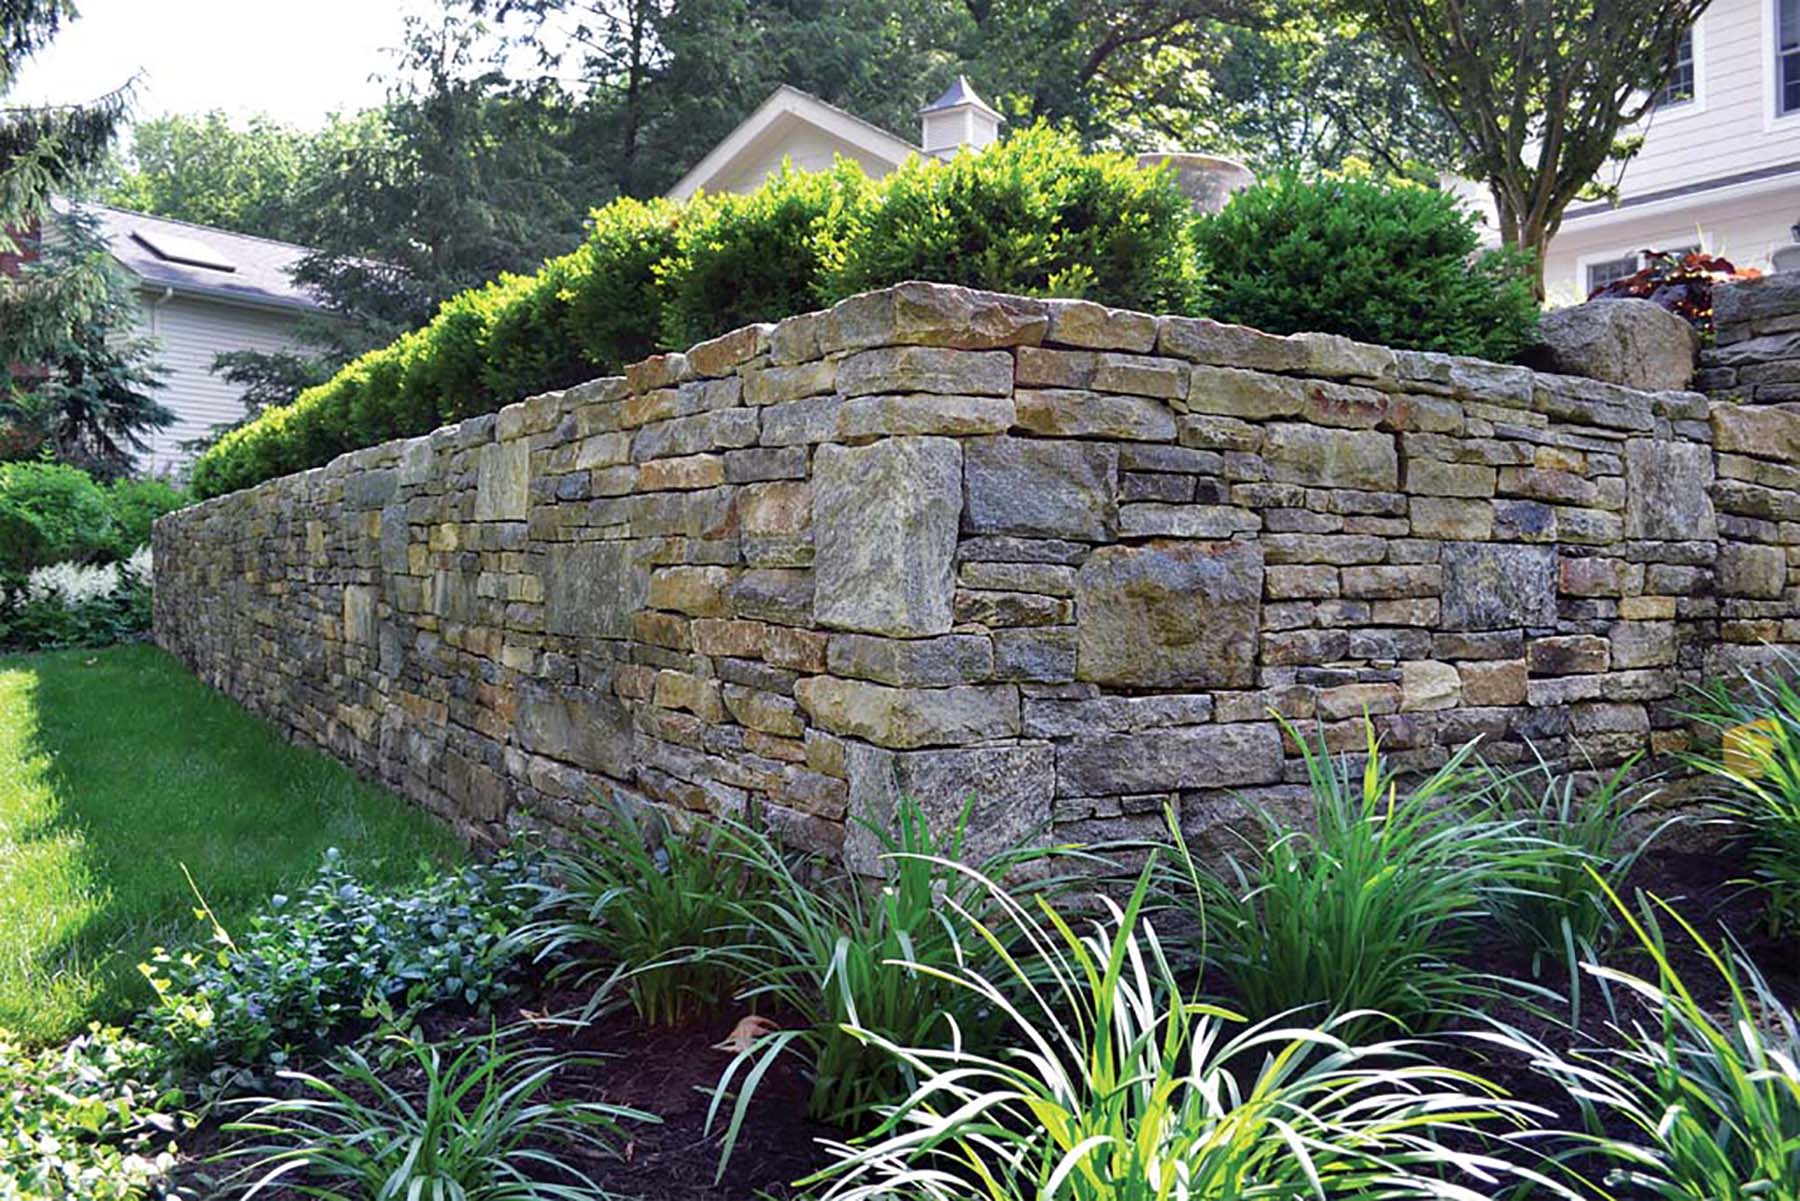 natural stone Ticonderoga granite retaining wall in residential backyard